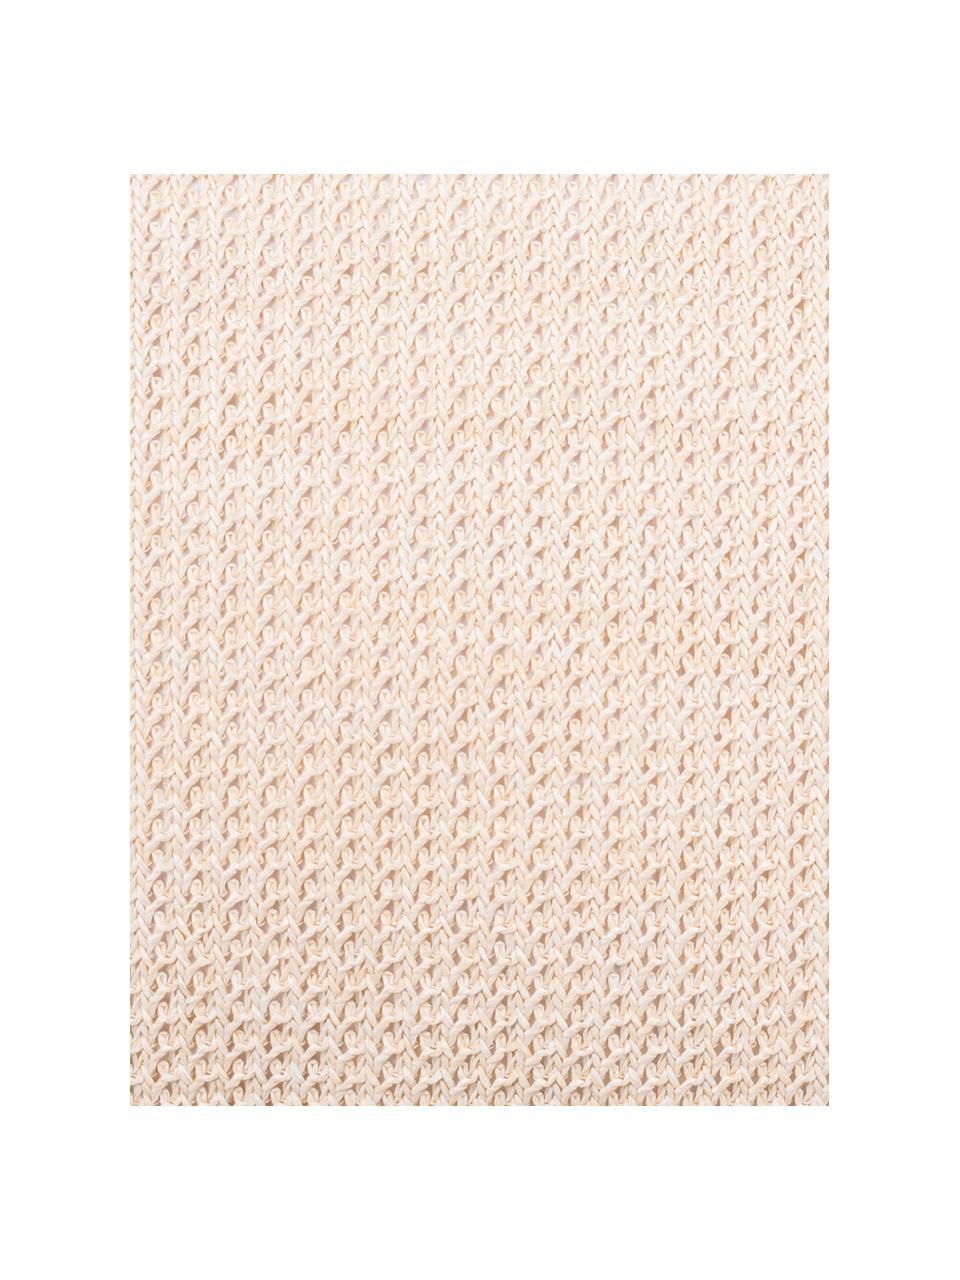 Housse de coussin 45x45 jute Tally, Blanc, beige